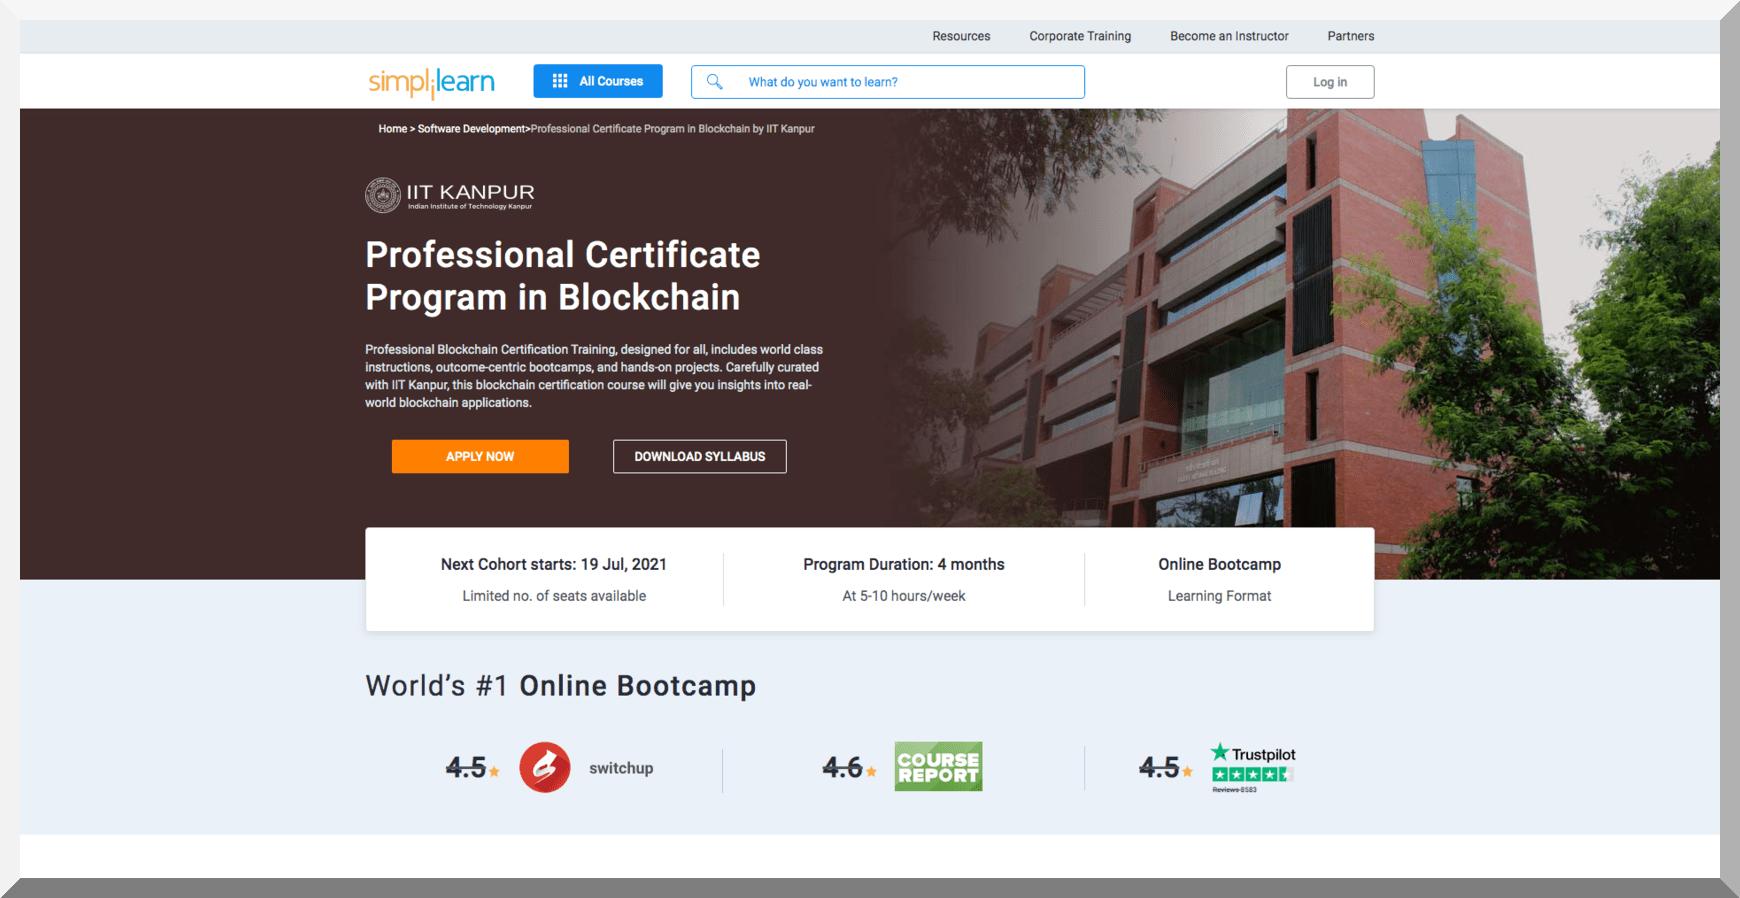 Professional Certificate Program in Blockchain - Simplilearn